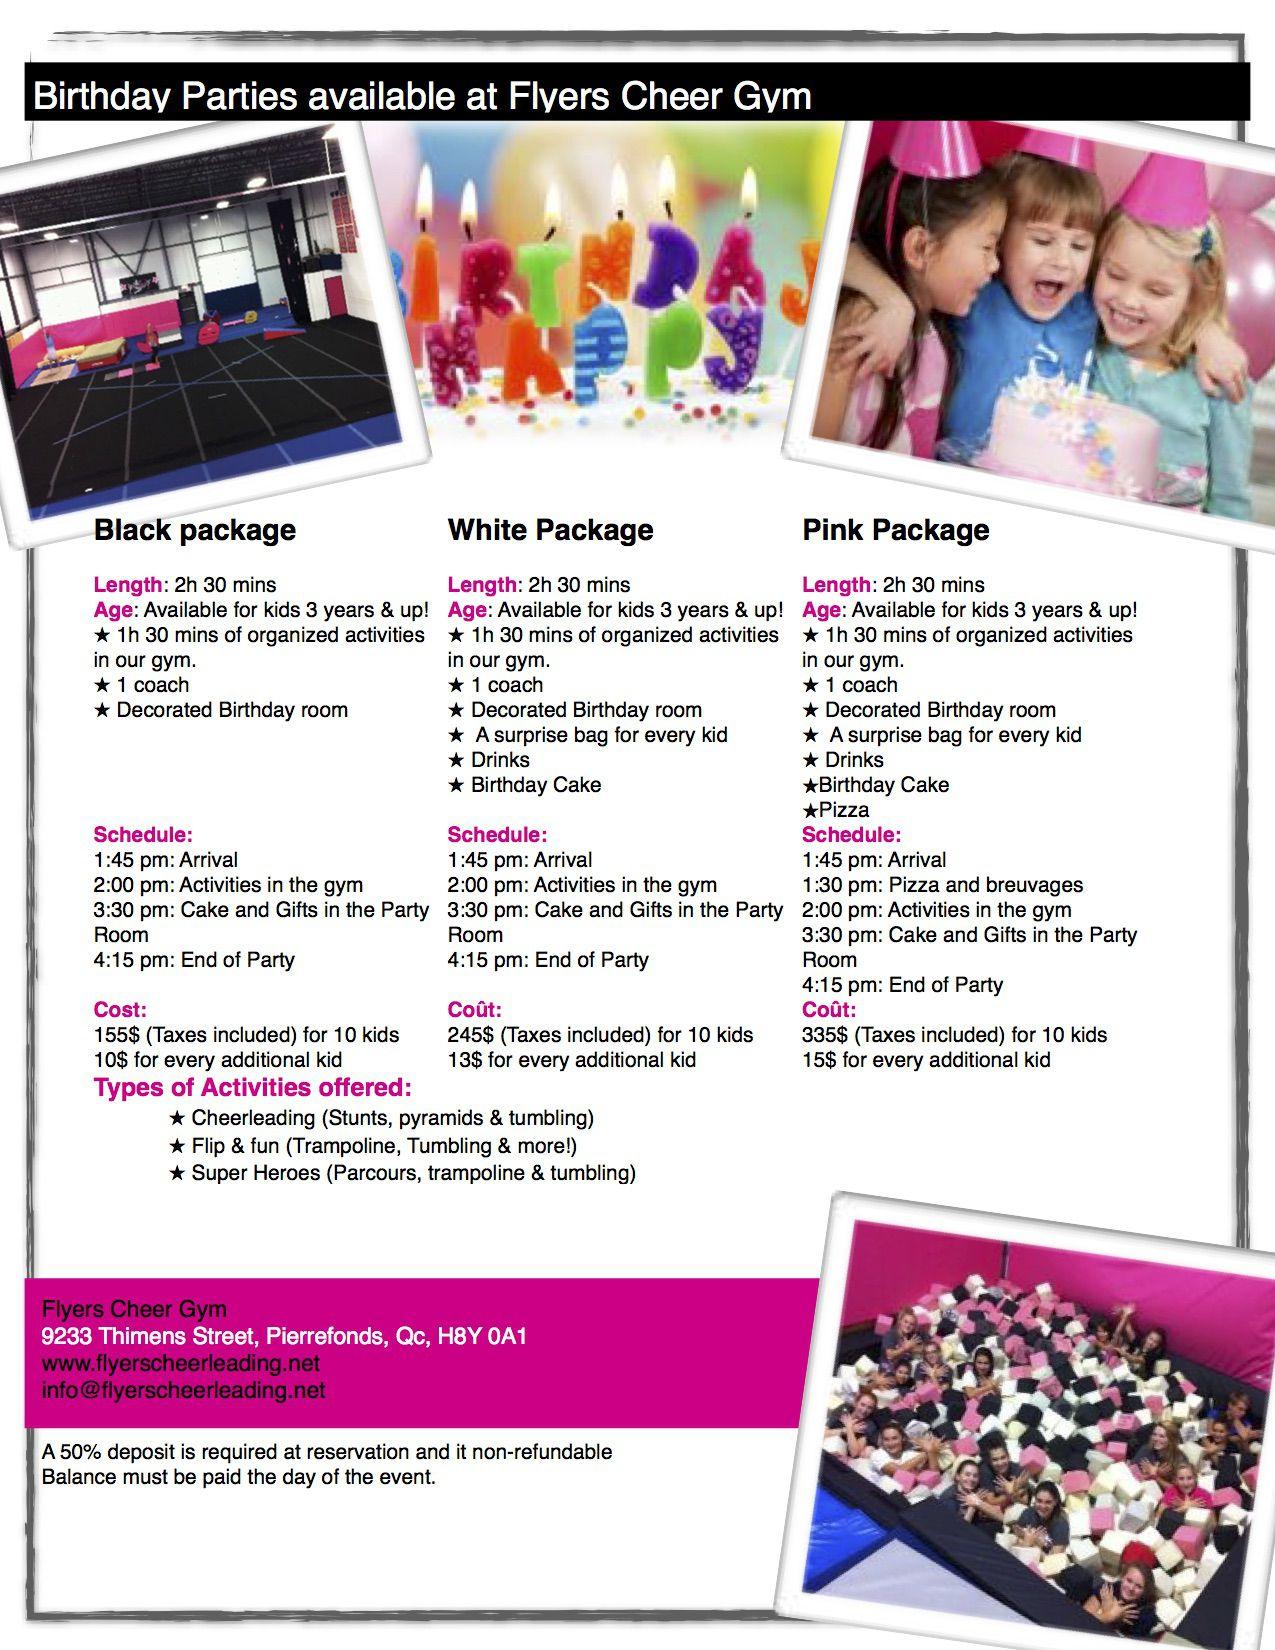 flyers cheerleading fêtes d enfants birthday parties